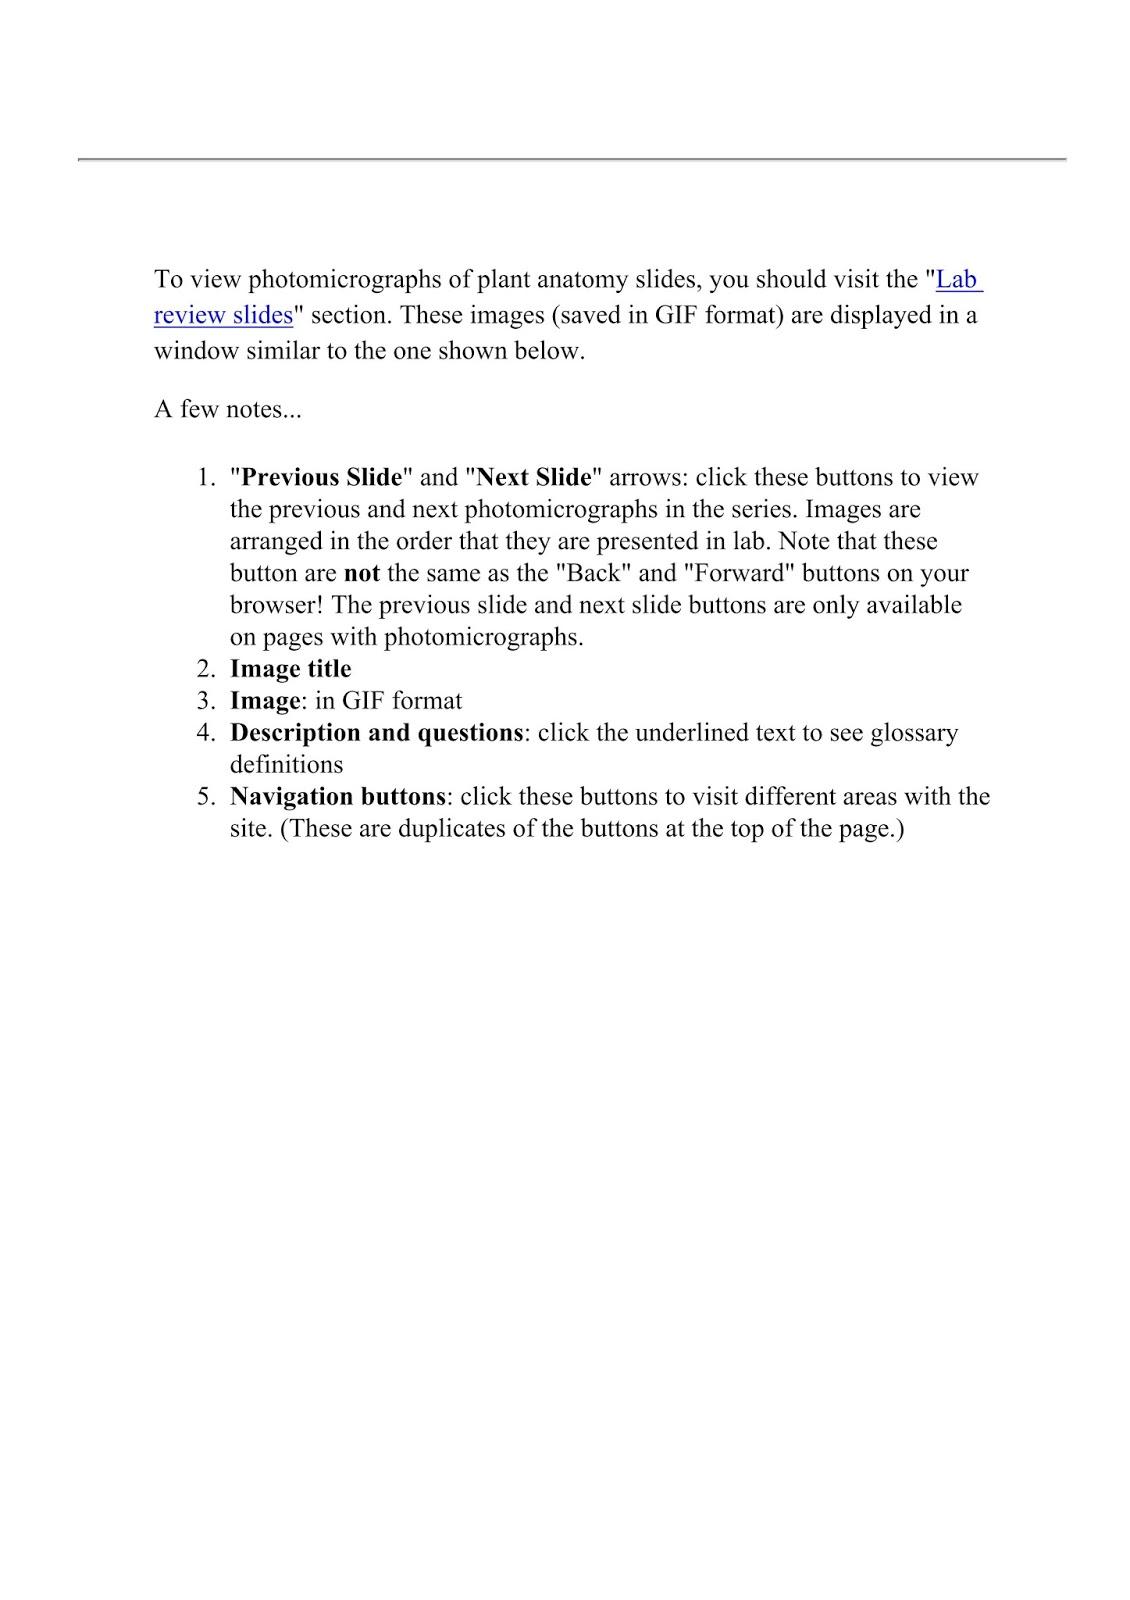 Alison Roberts. 2002. Plant Anatomy BIO311 | PLANT BOOKS